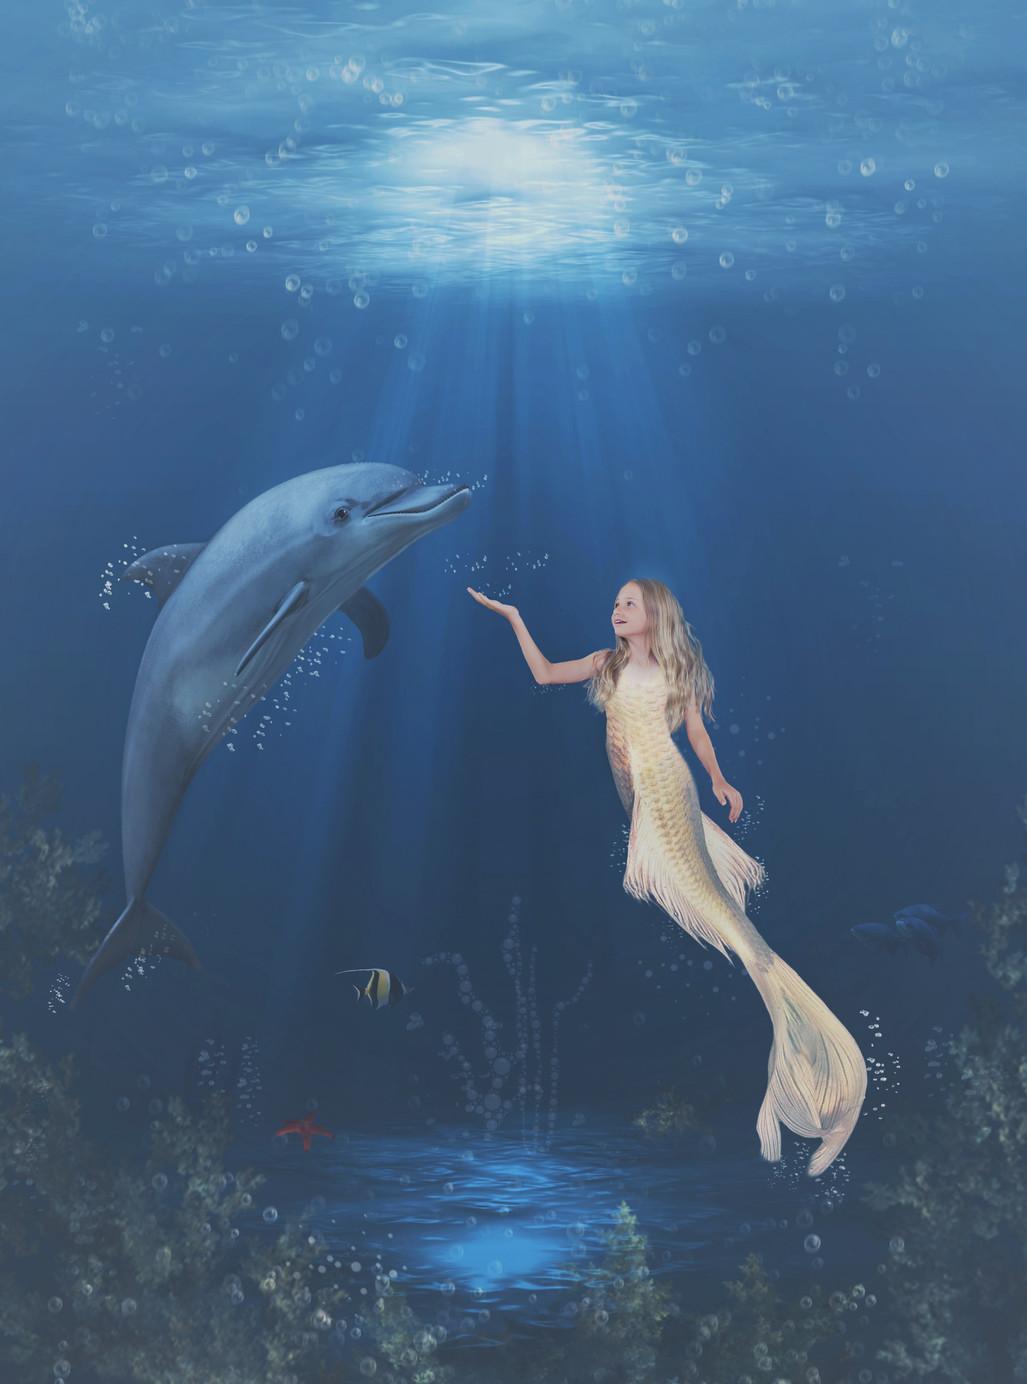 Ava and dolphin Final No WM.jpg